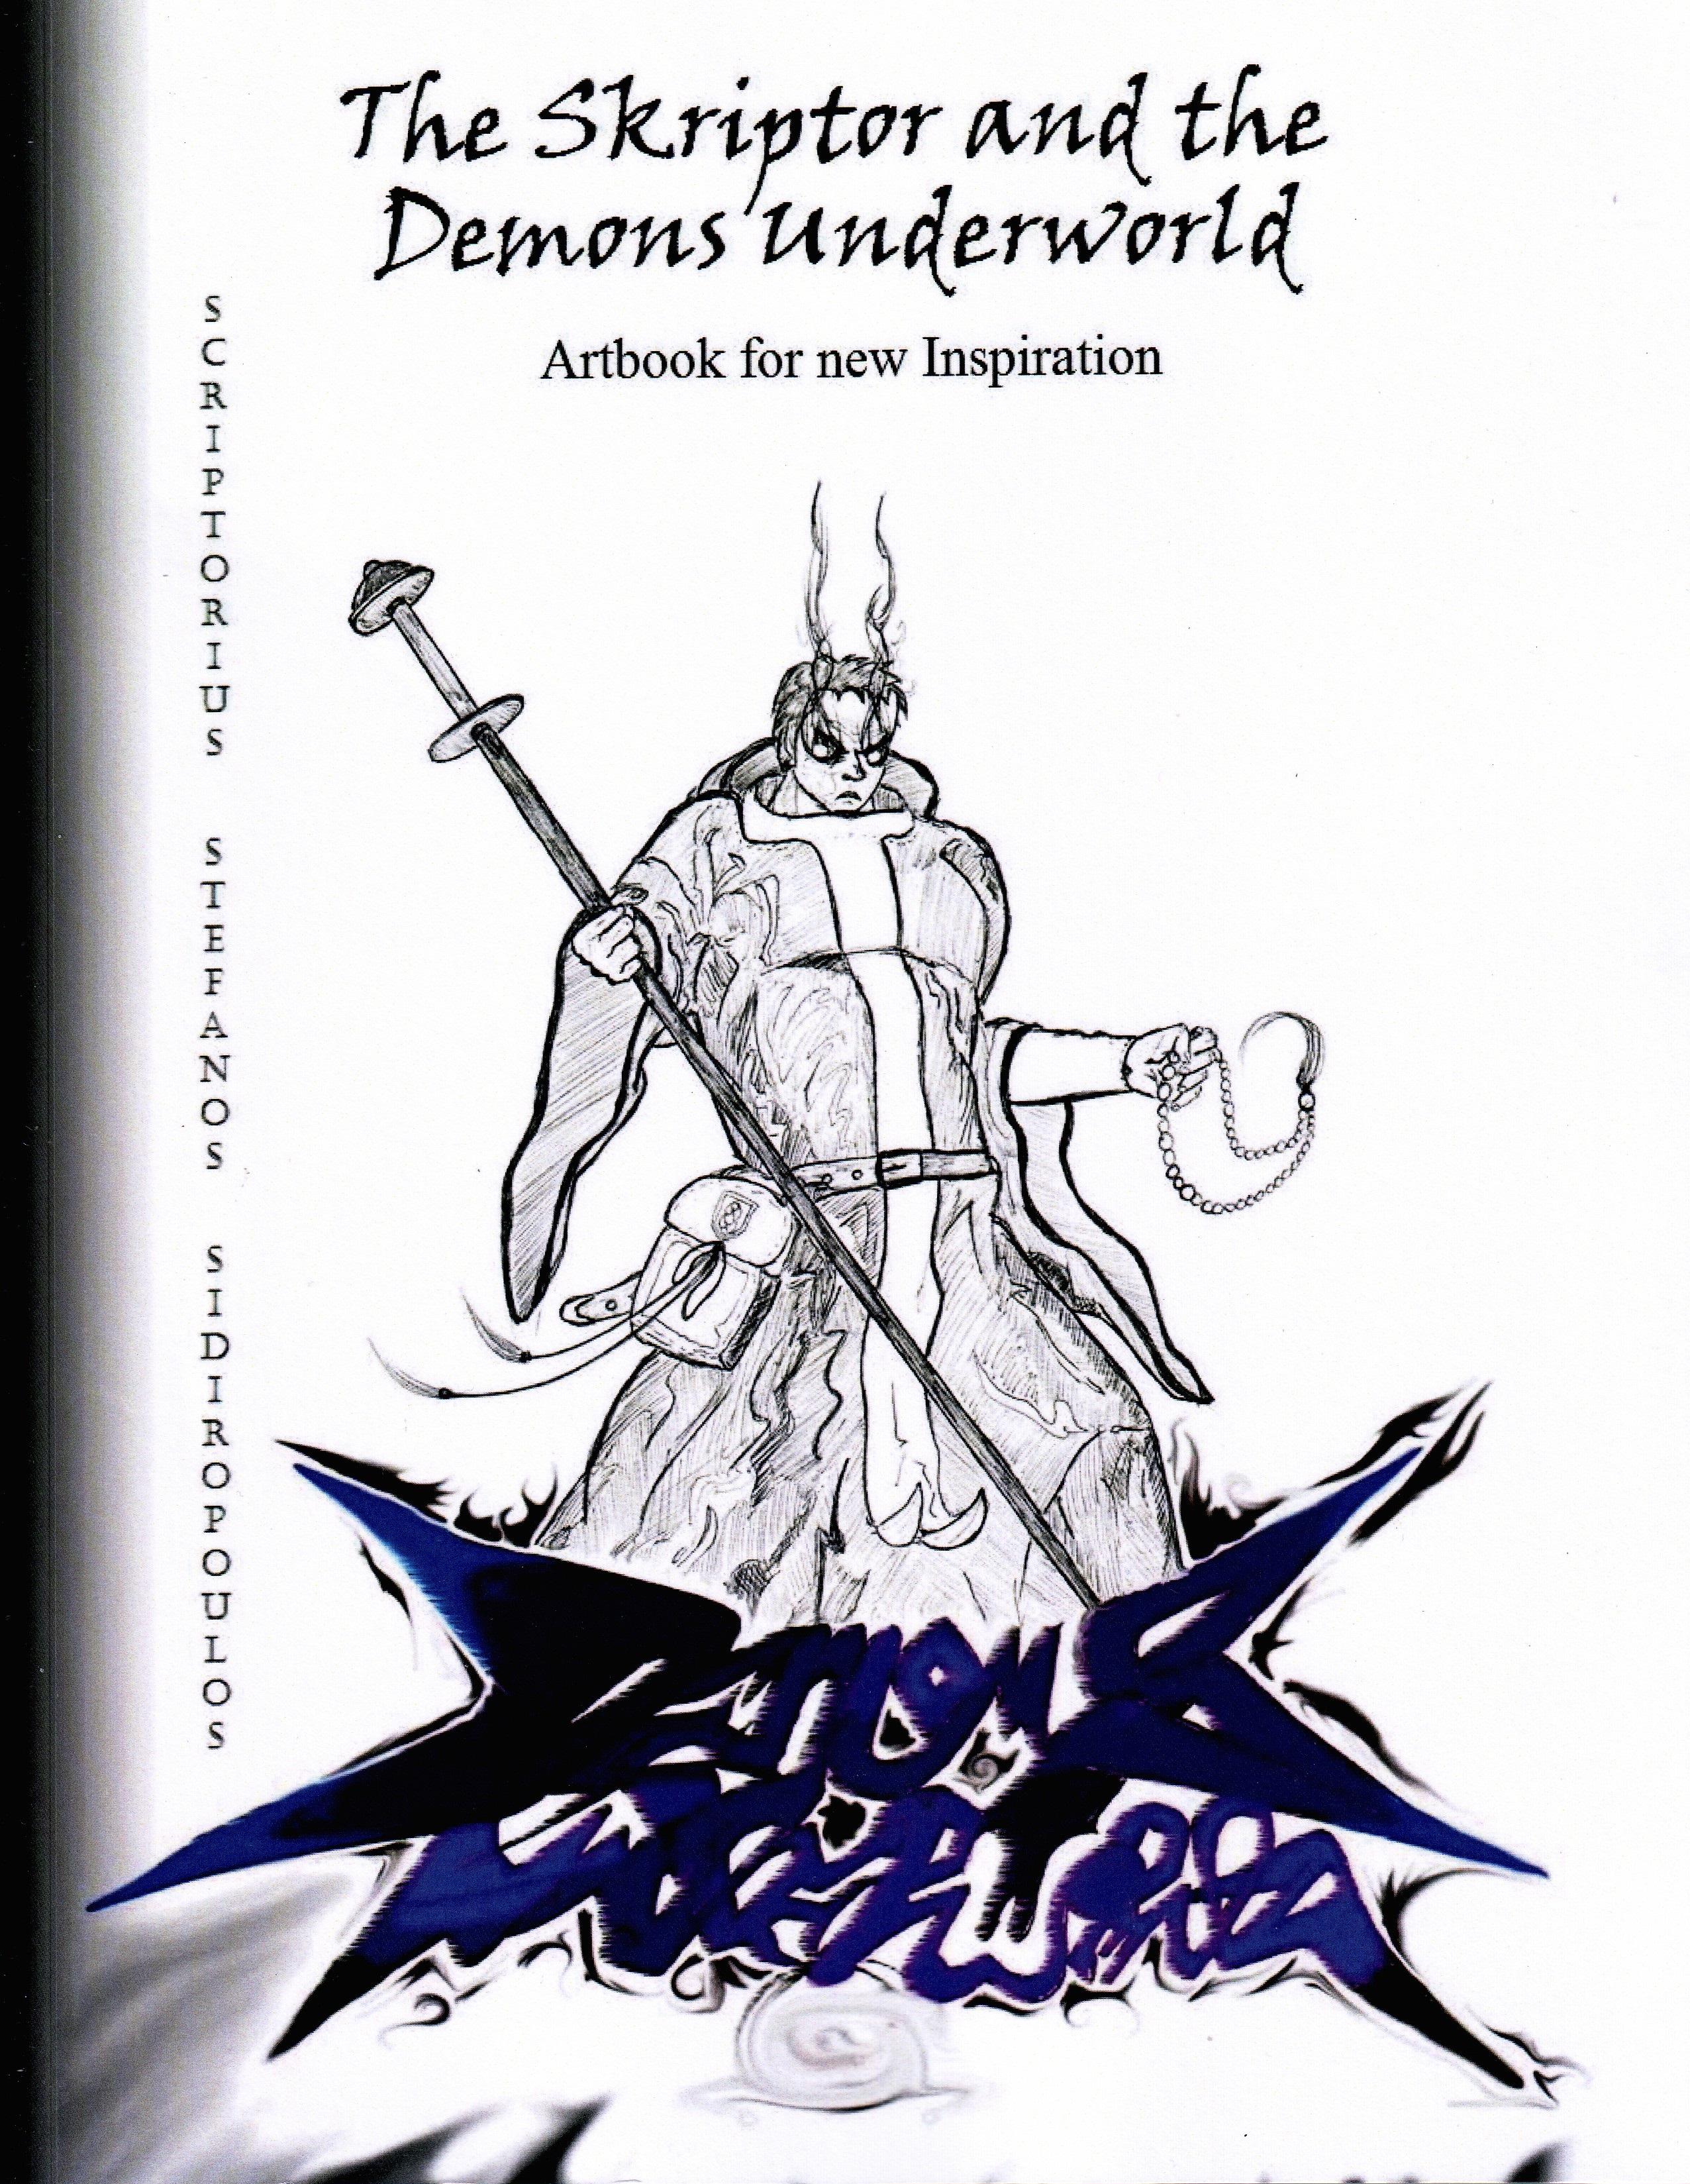 Artbook No.1: The Skriptor and the Demons Underworld